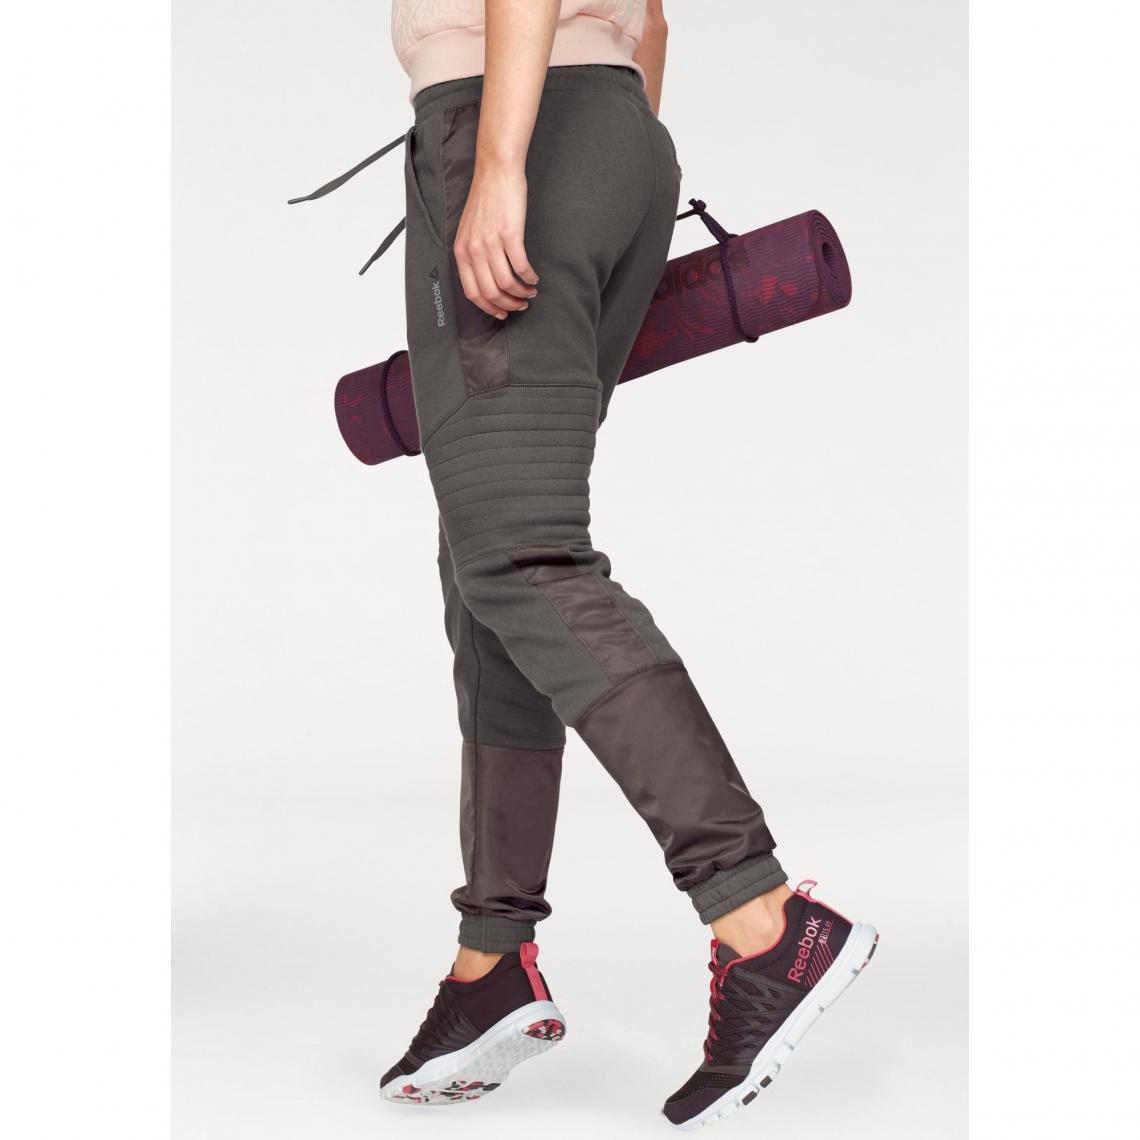 Sport Reebok 3suisses Moto Femme Jogger Pantalon Marron 6wTx1qd10 54d158fdbd7